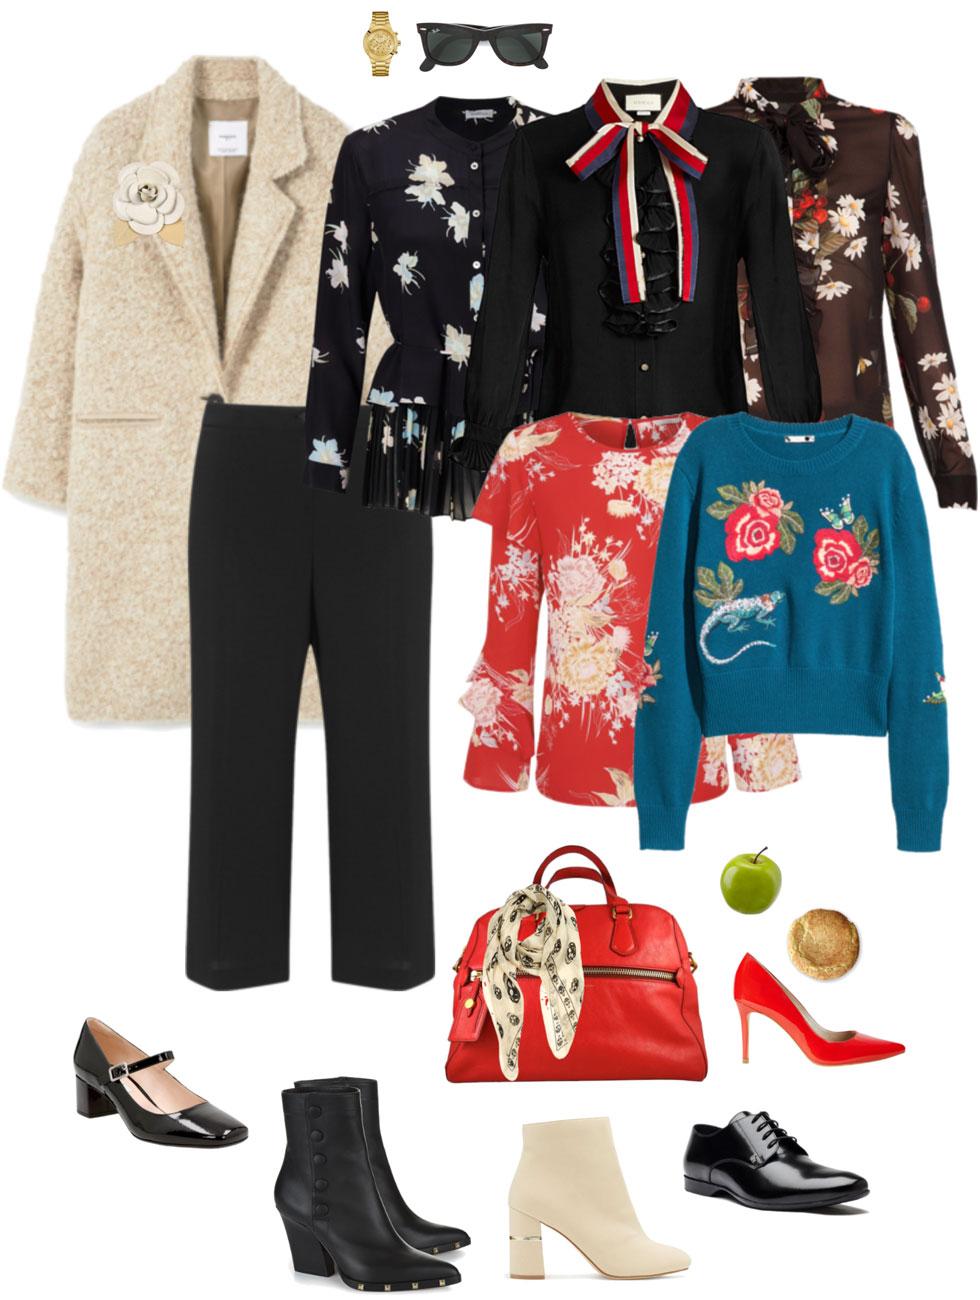 Ensemble Style Advice - Culottes & Cocoon Coat